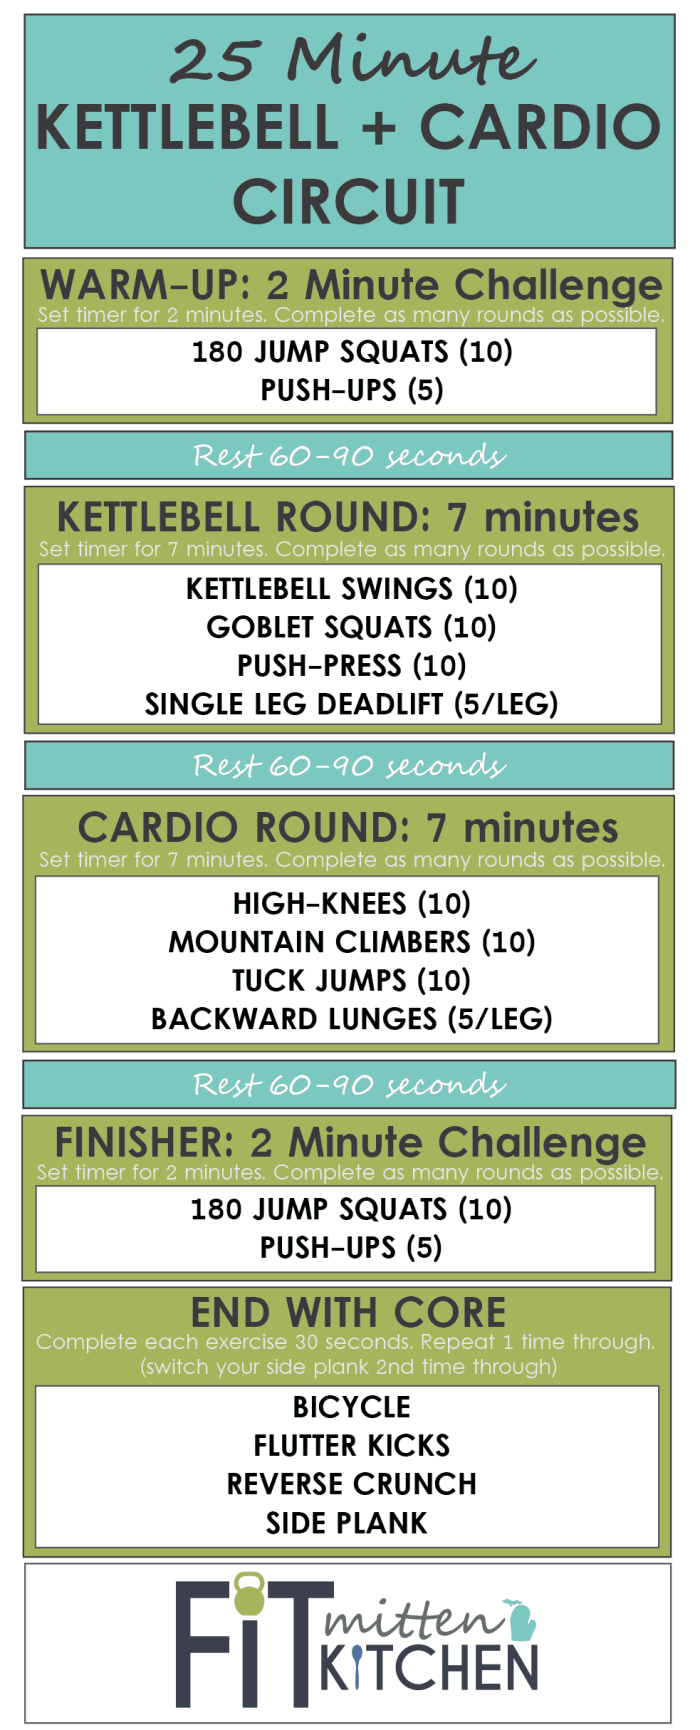 25 Minute Kettlebell + Cardio Circuit